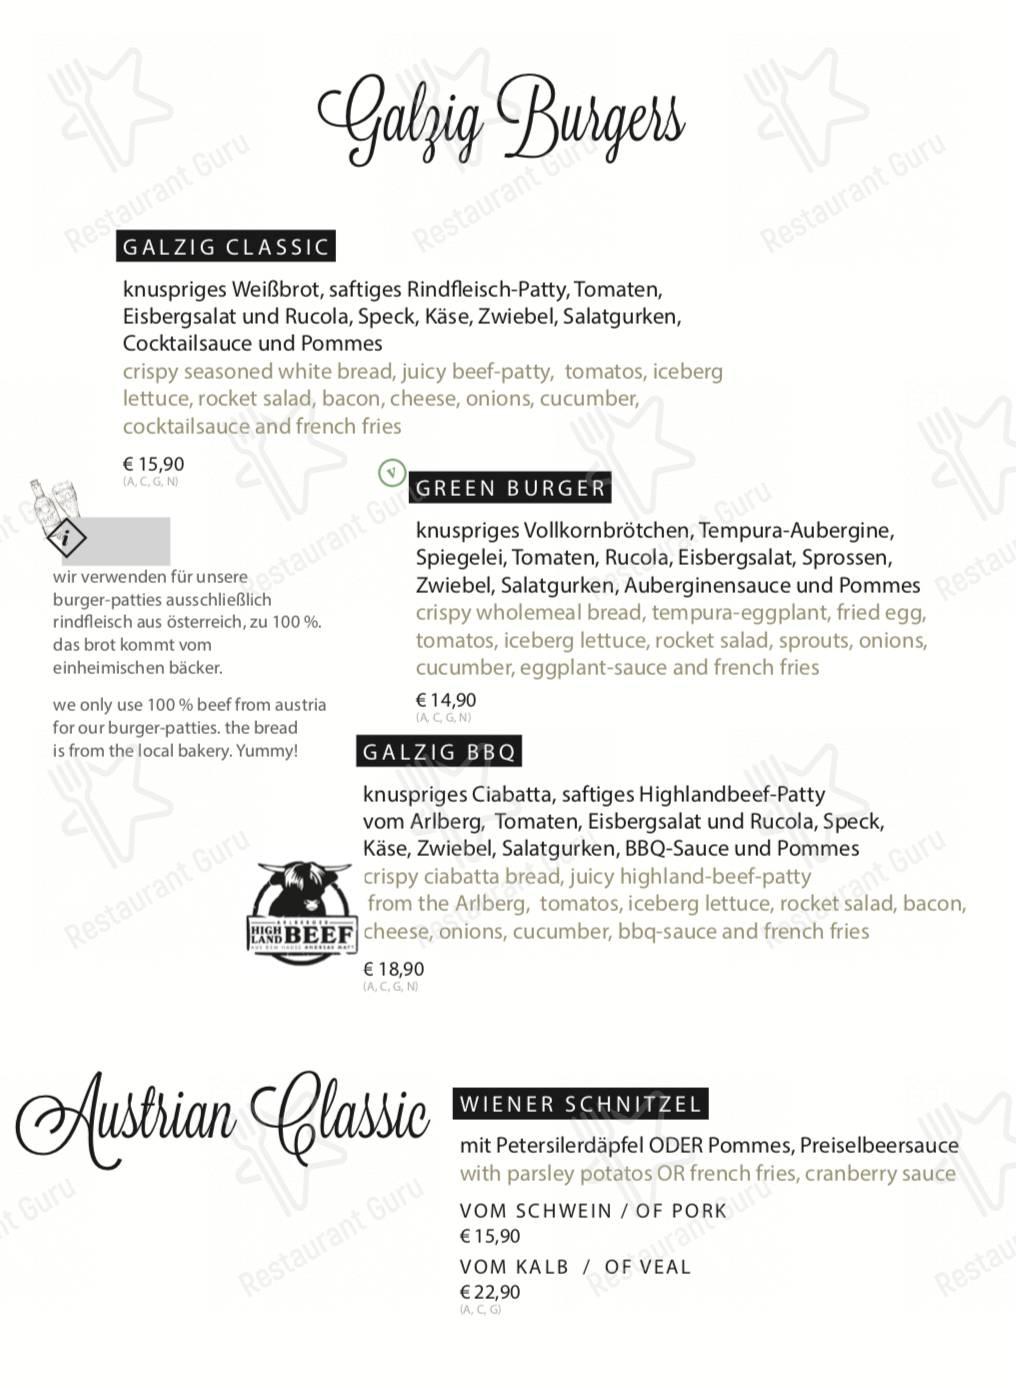 Galzig Bistrobar menu - meals and drinks